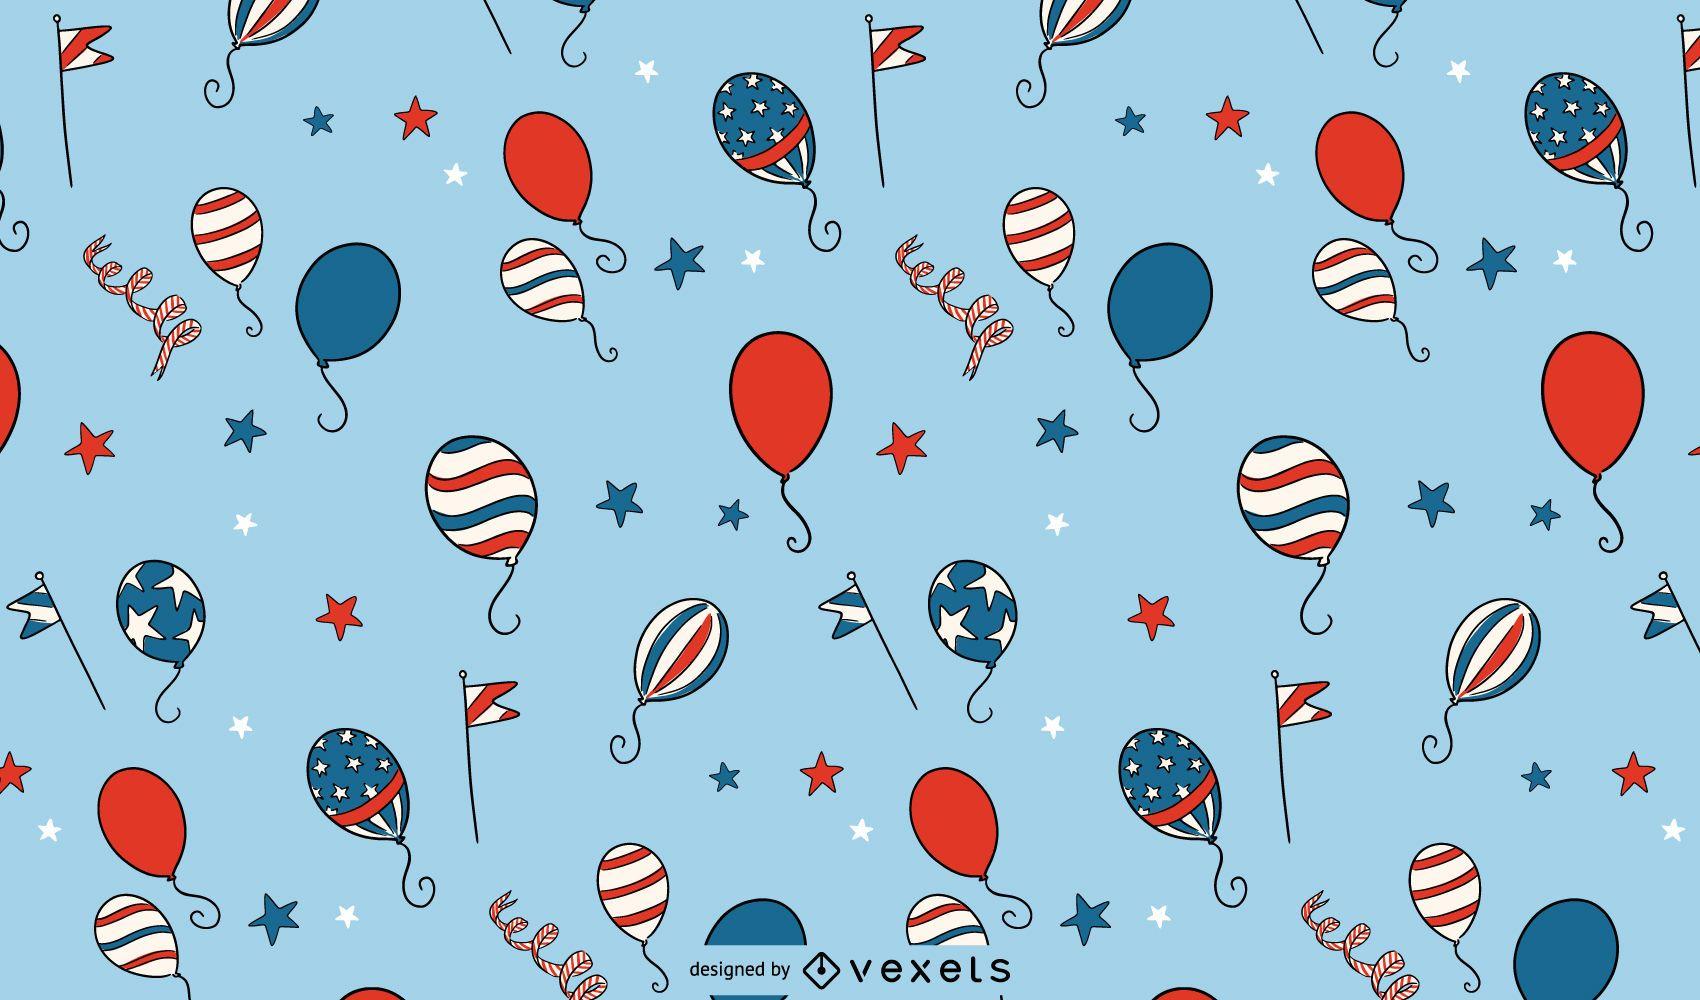 Unabhängigkeitstagballonmuster